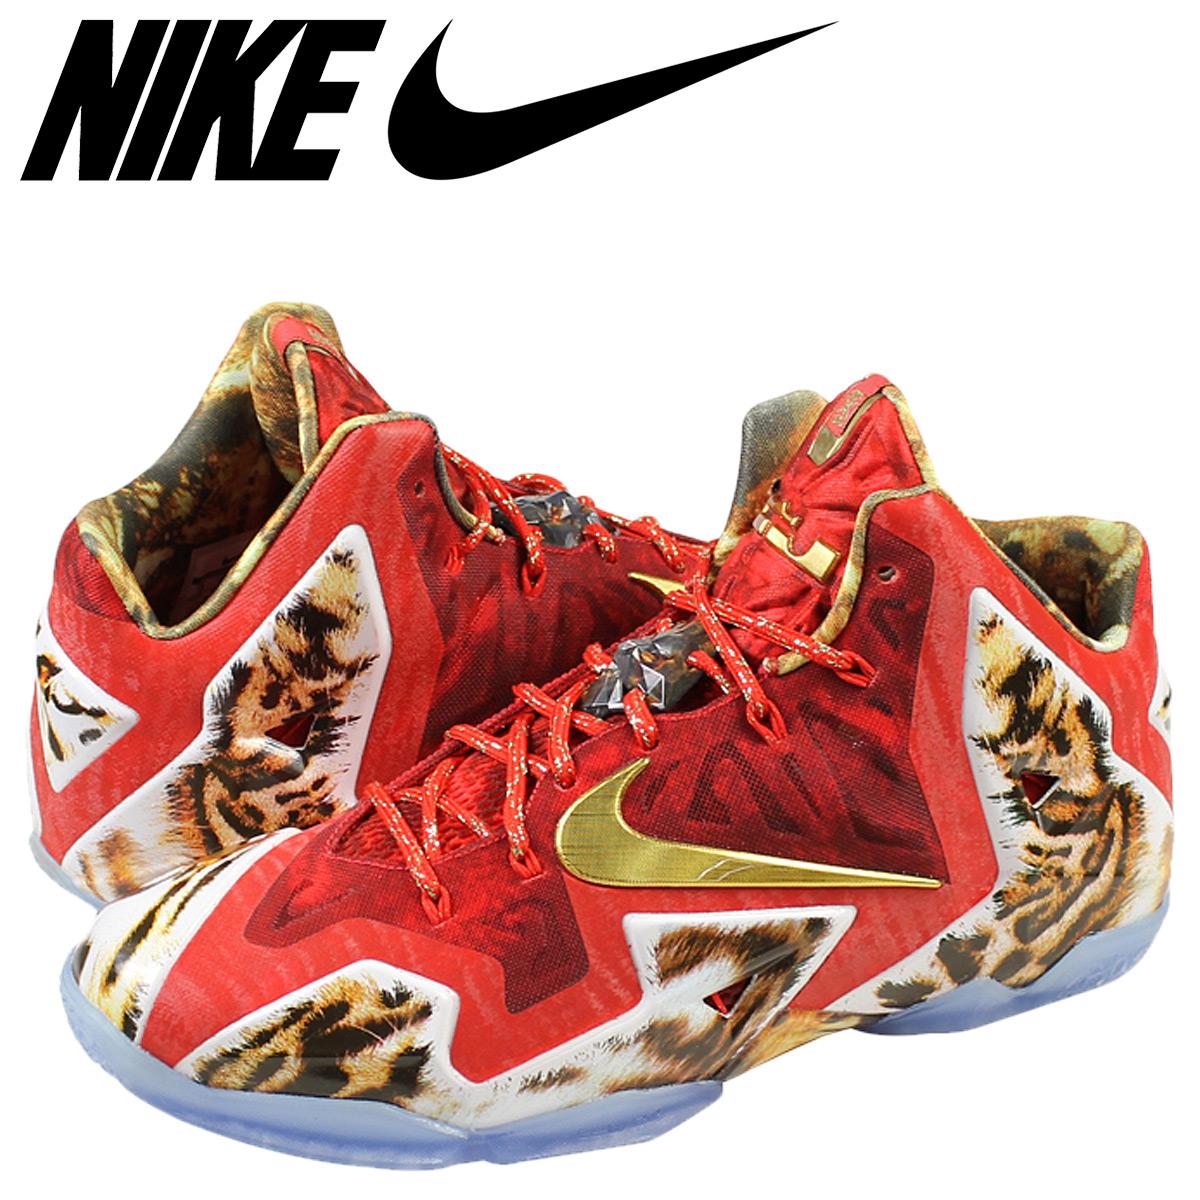 best loved 0db53 2629f NIKE Nike LeBron sneakers NBA 2 K 14 x 11 PRM LEBRON LeBron 11 premium  650884 - 674 red mens